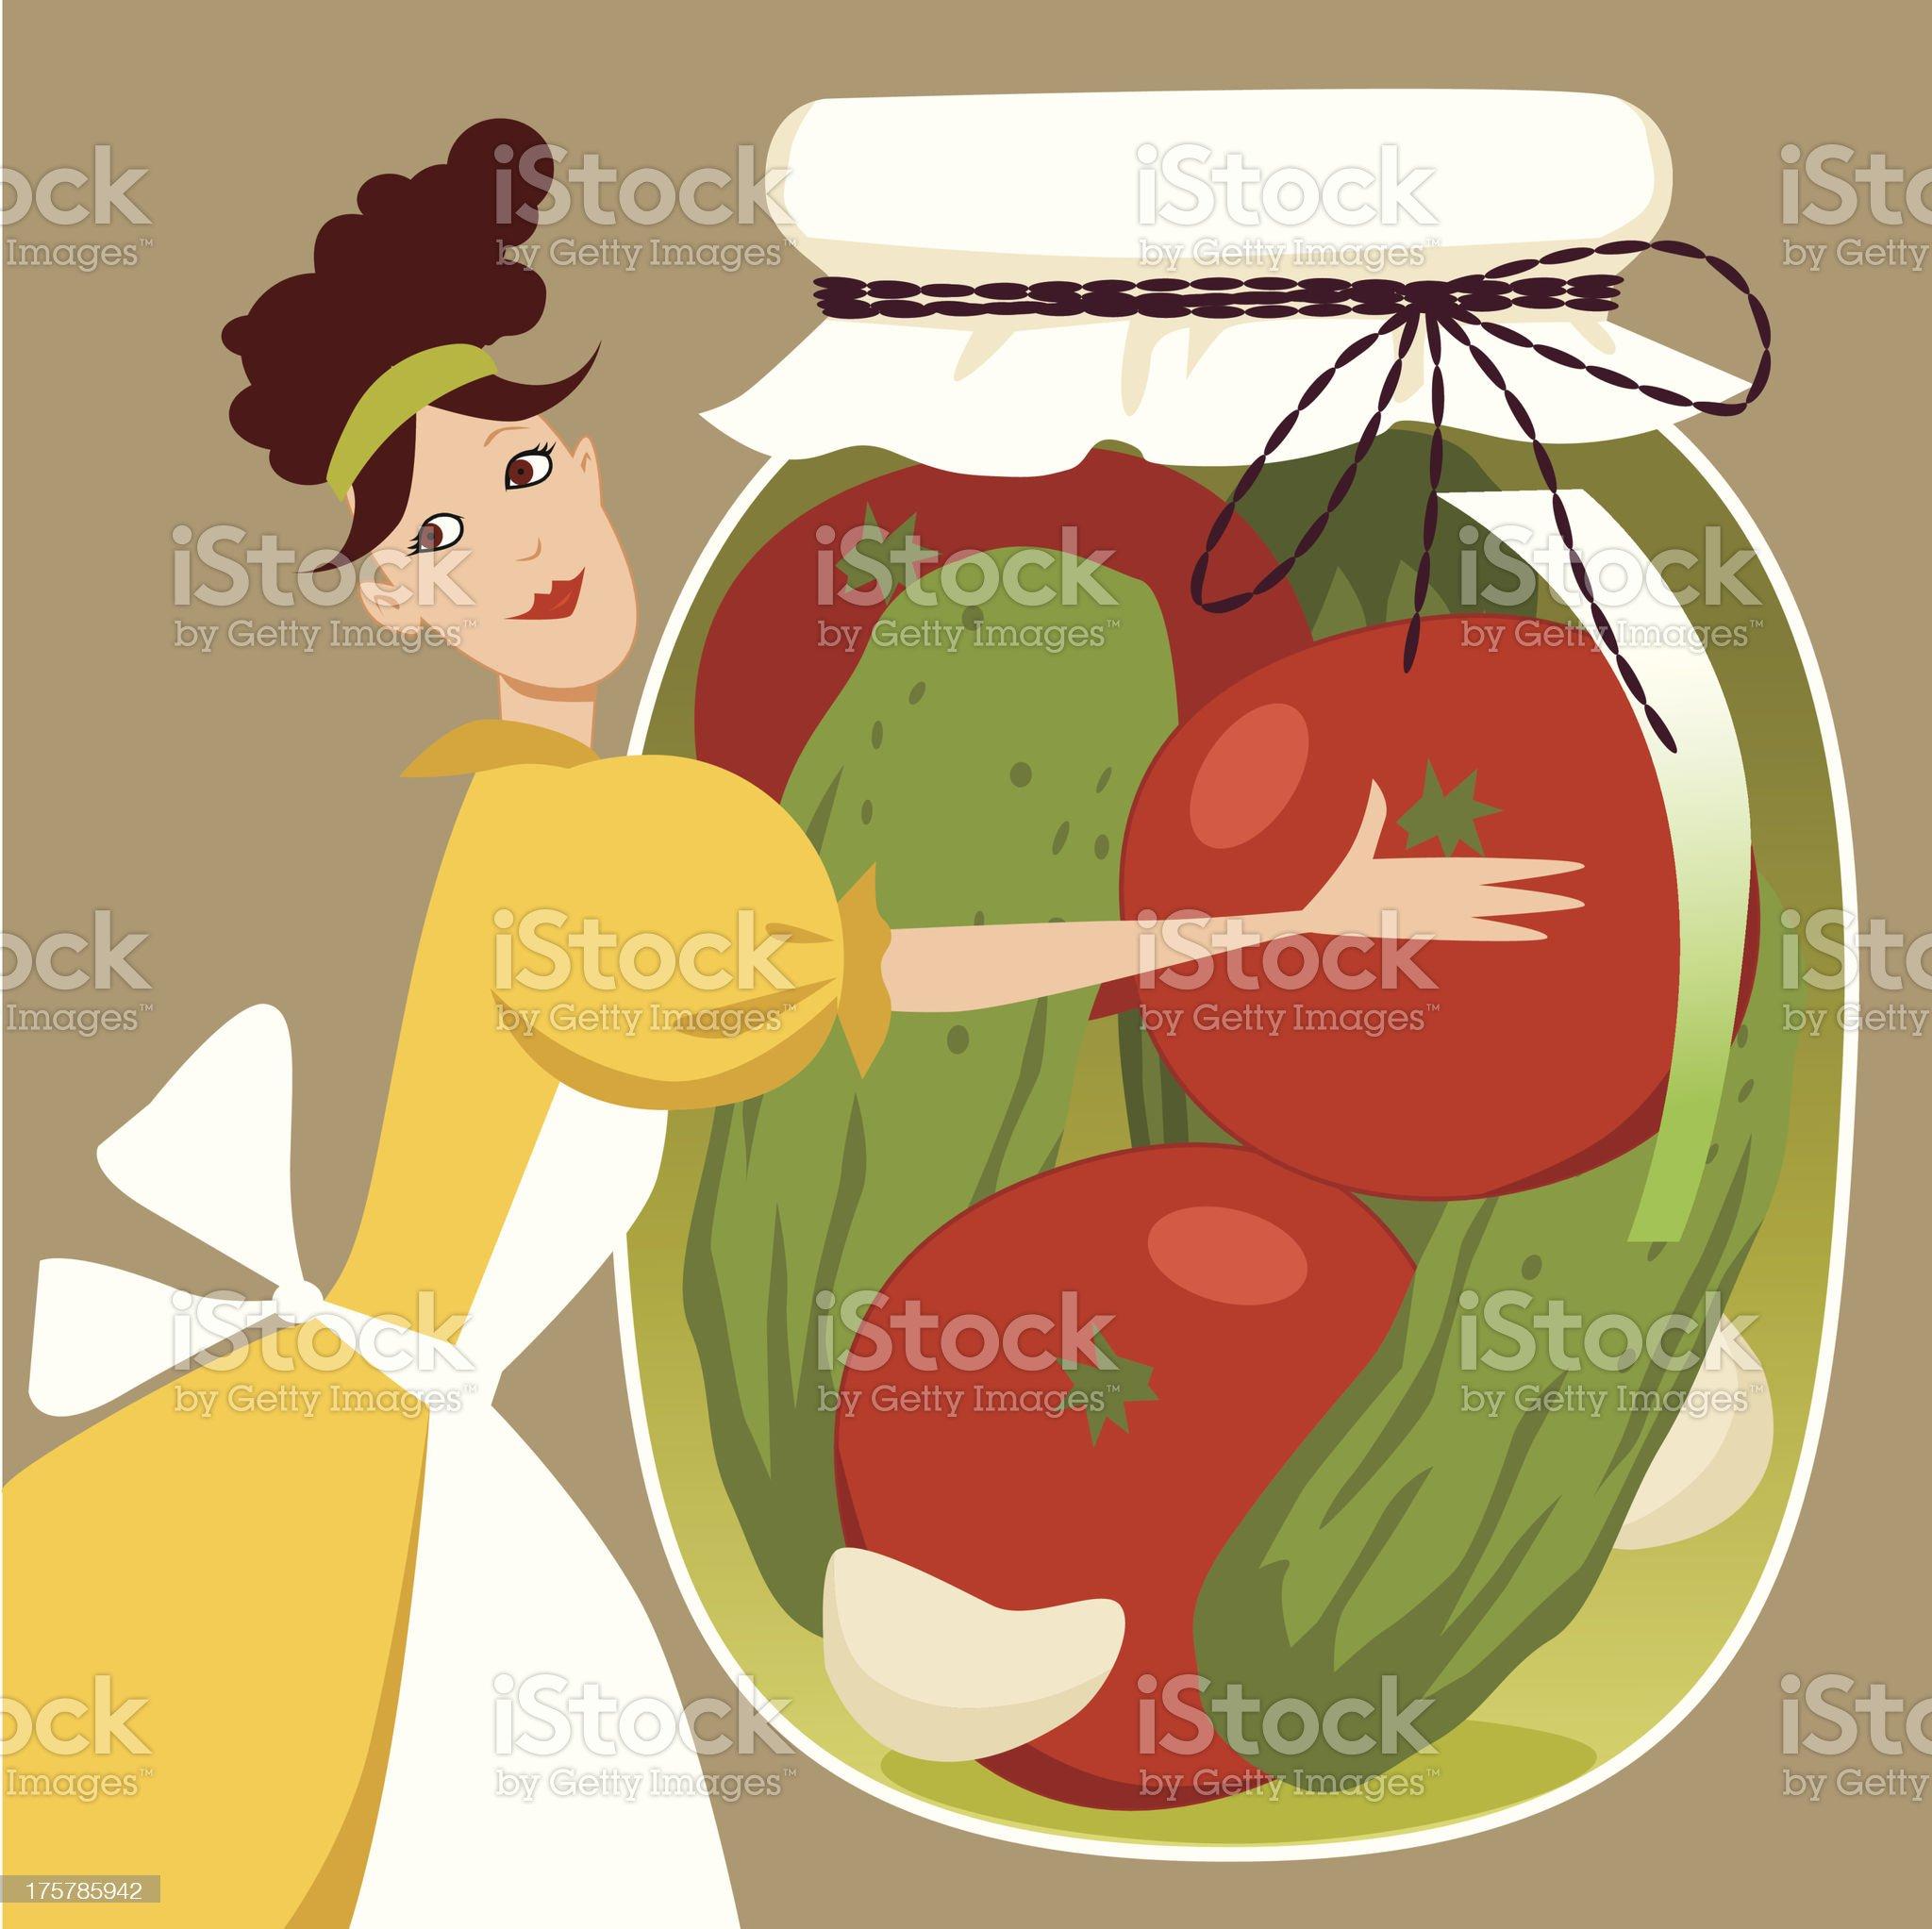 Pickled vegetables royalty-free stock vector art